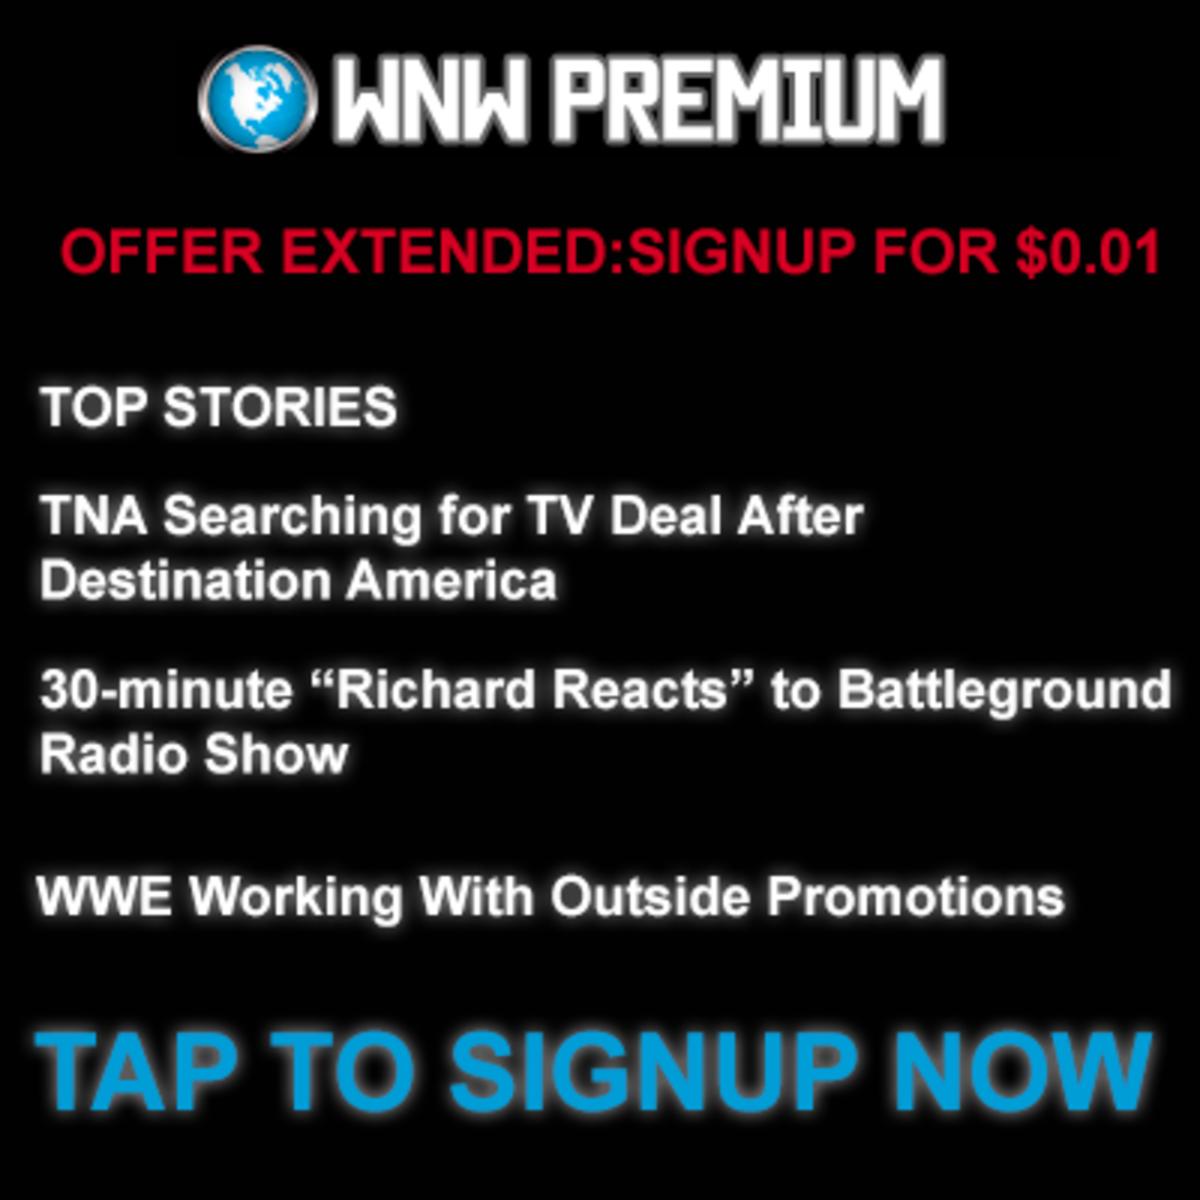 WNW Premium